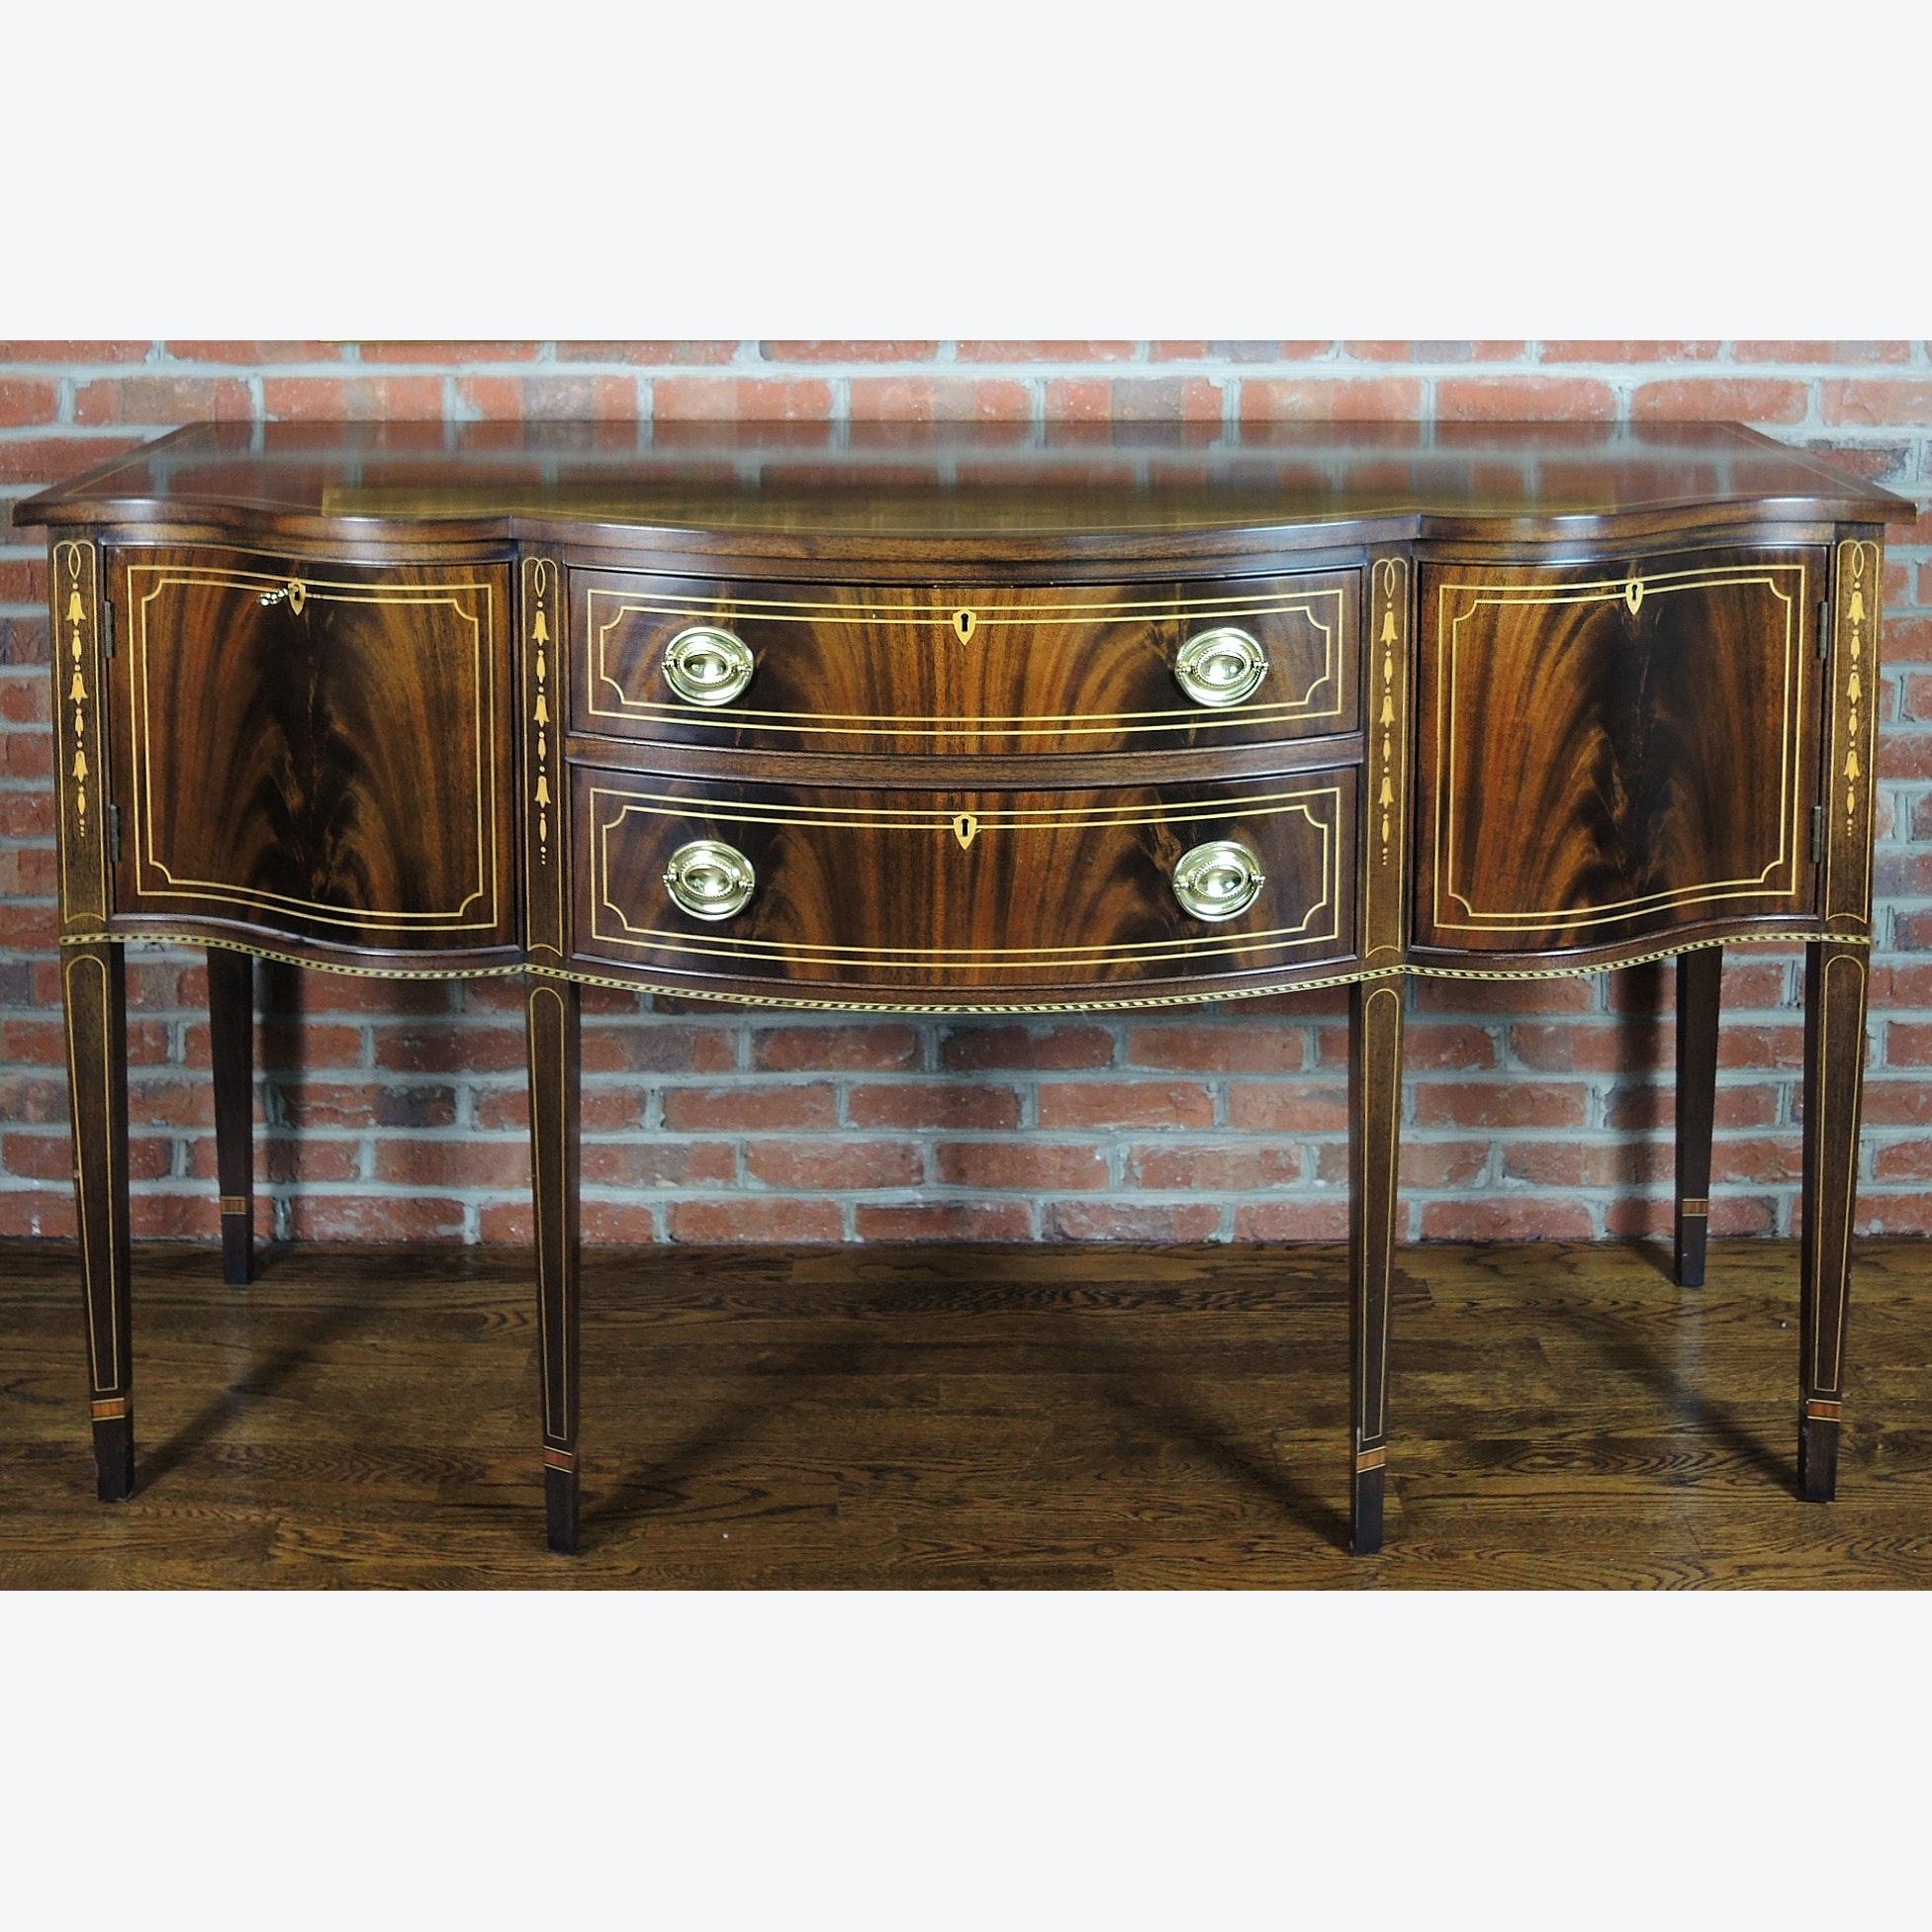 Hepplewhite Style Mahogany Sideboard by Stickley